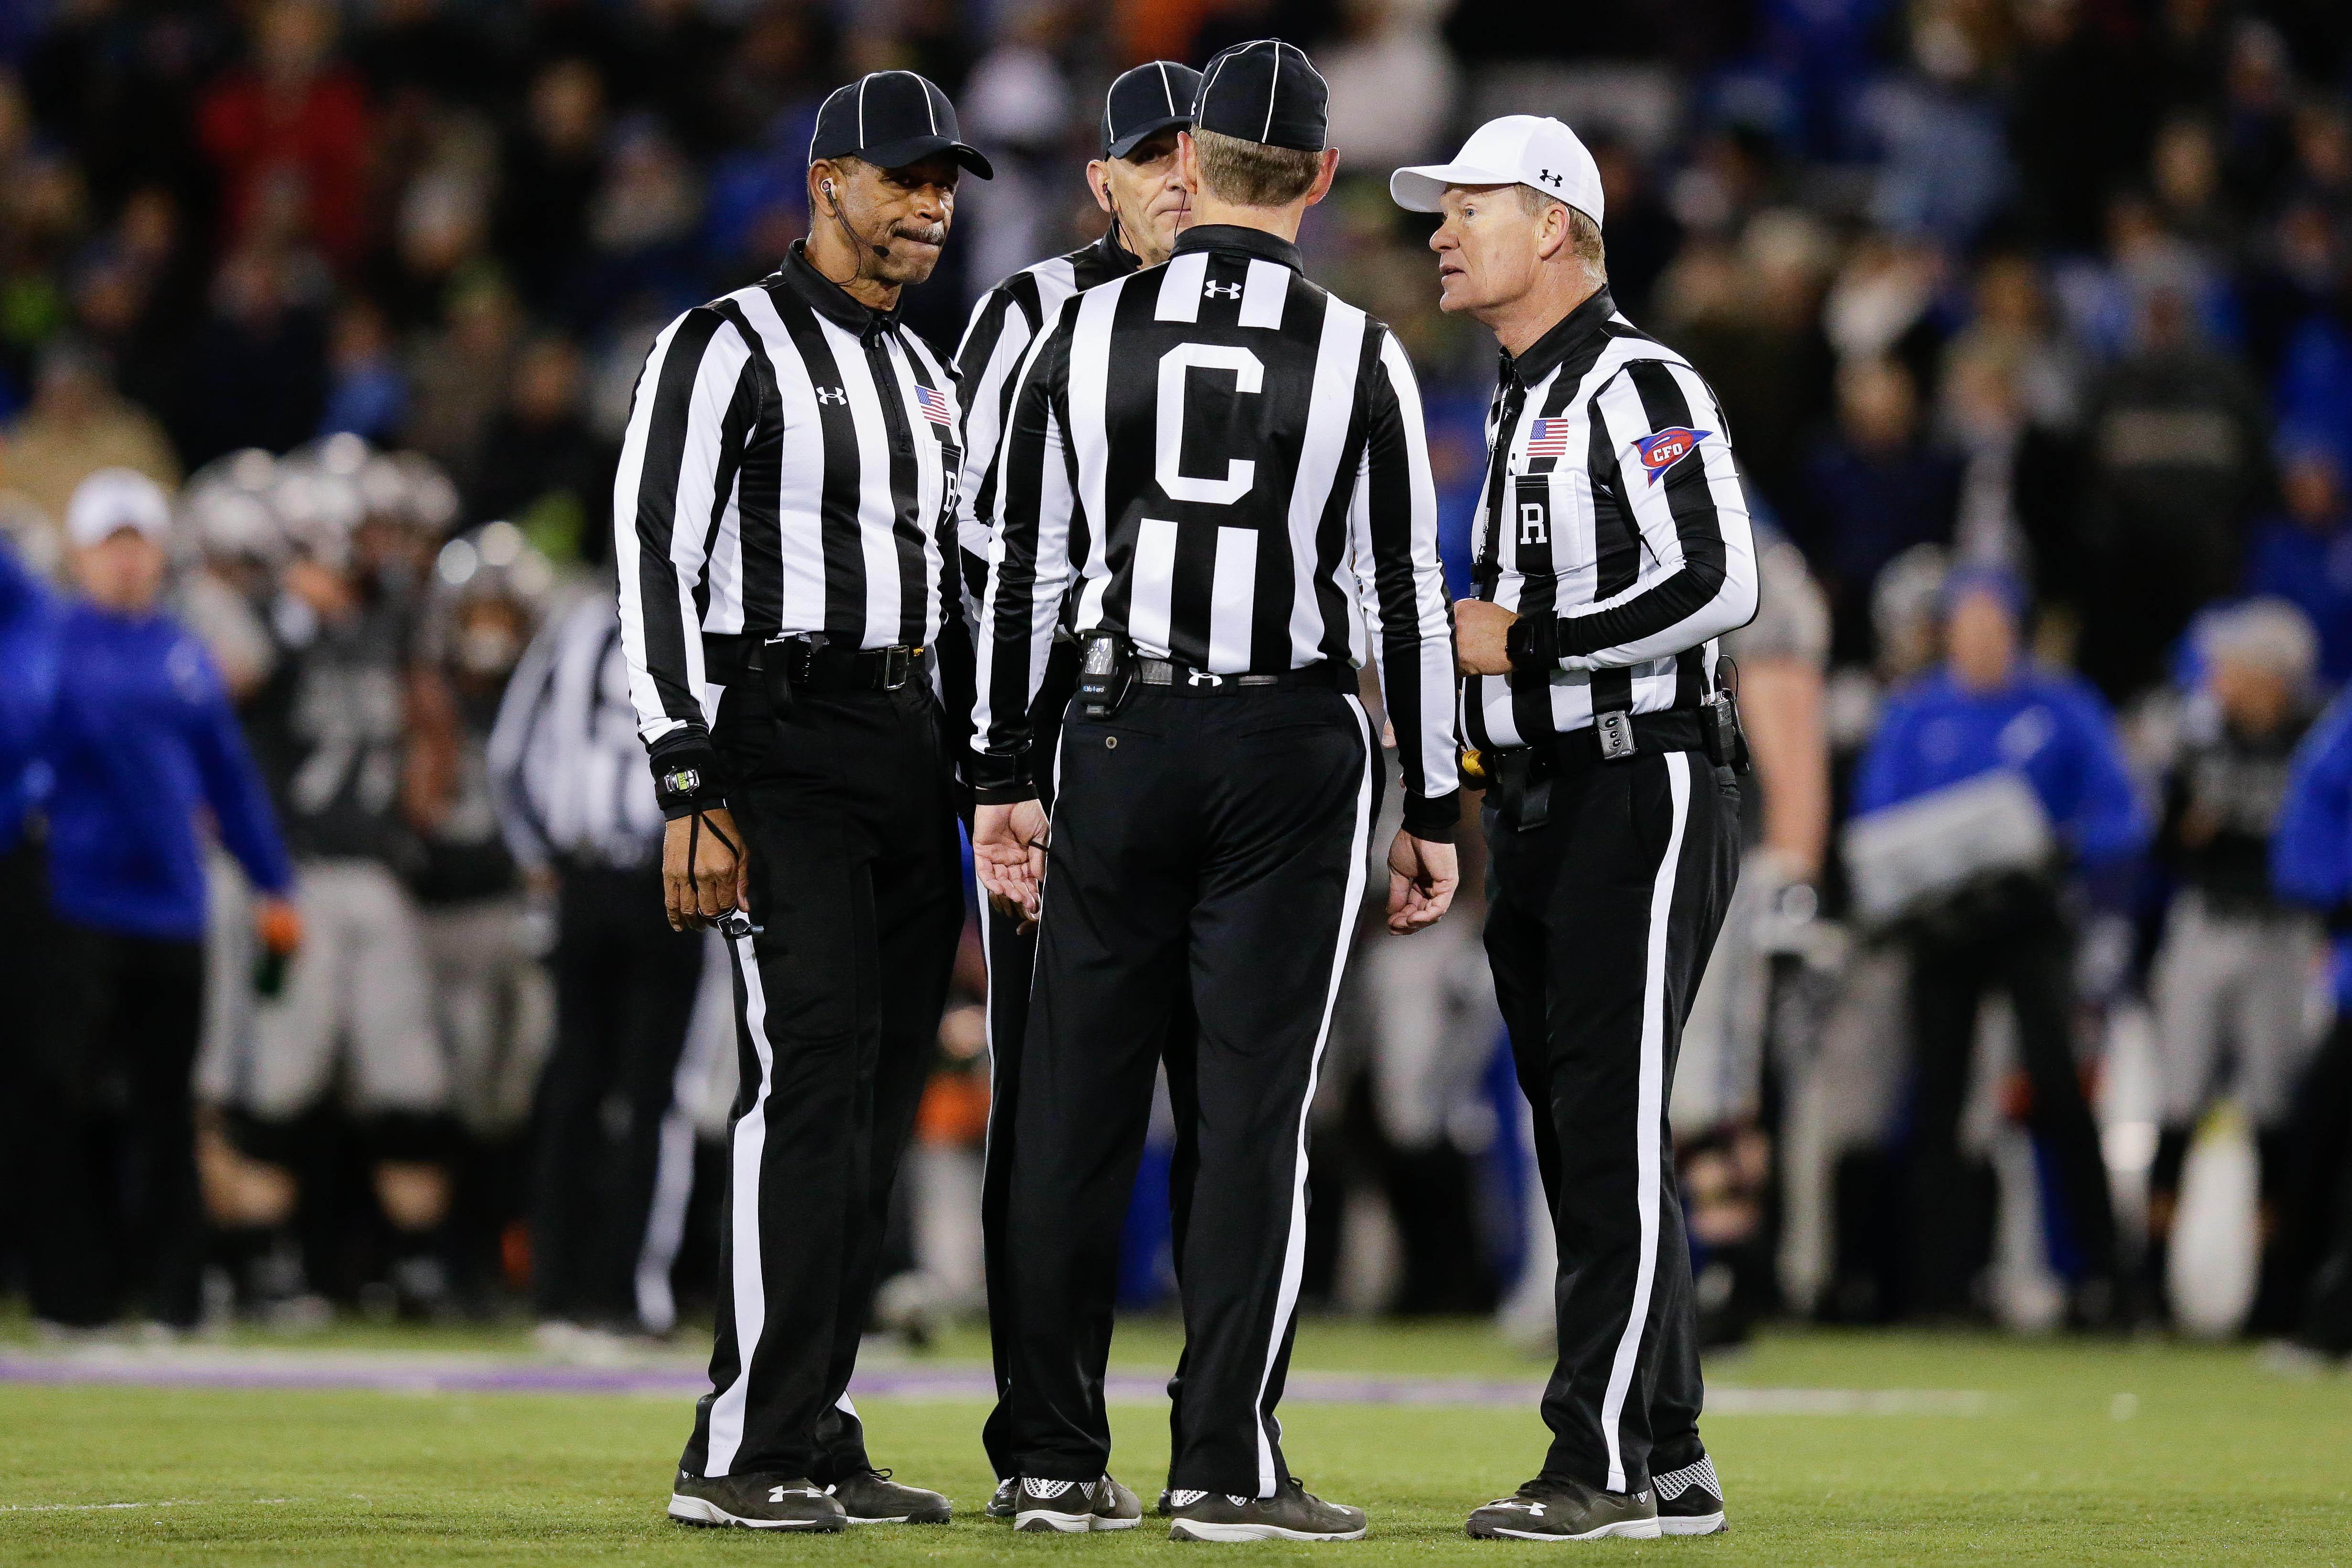 NCAA Football Referees